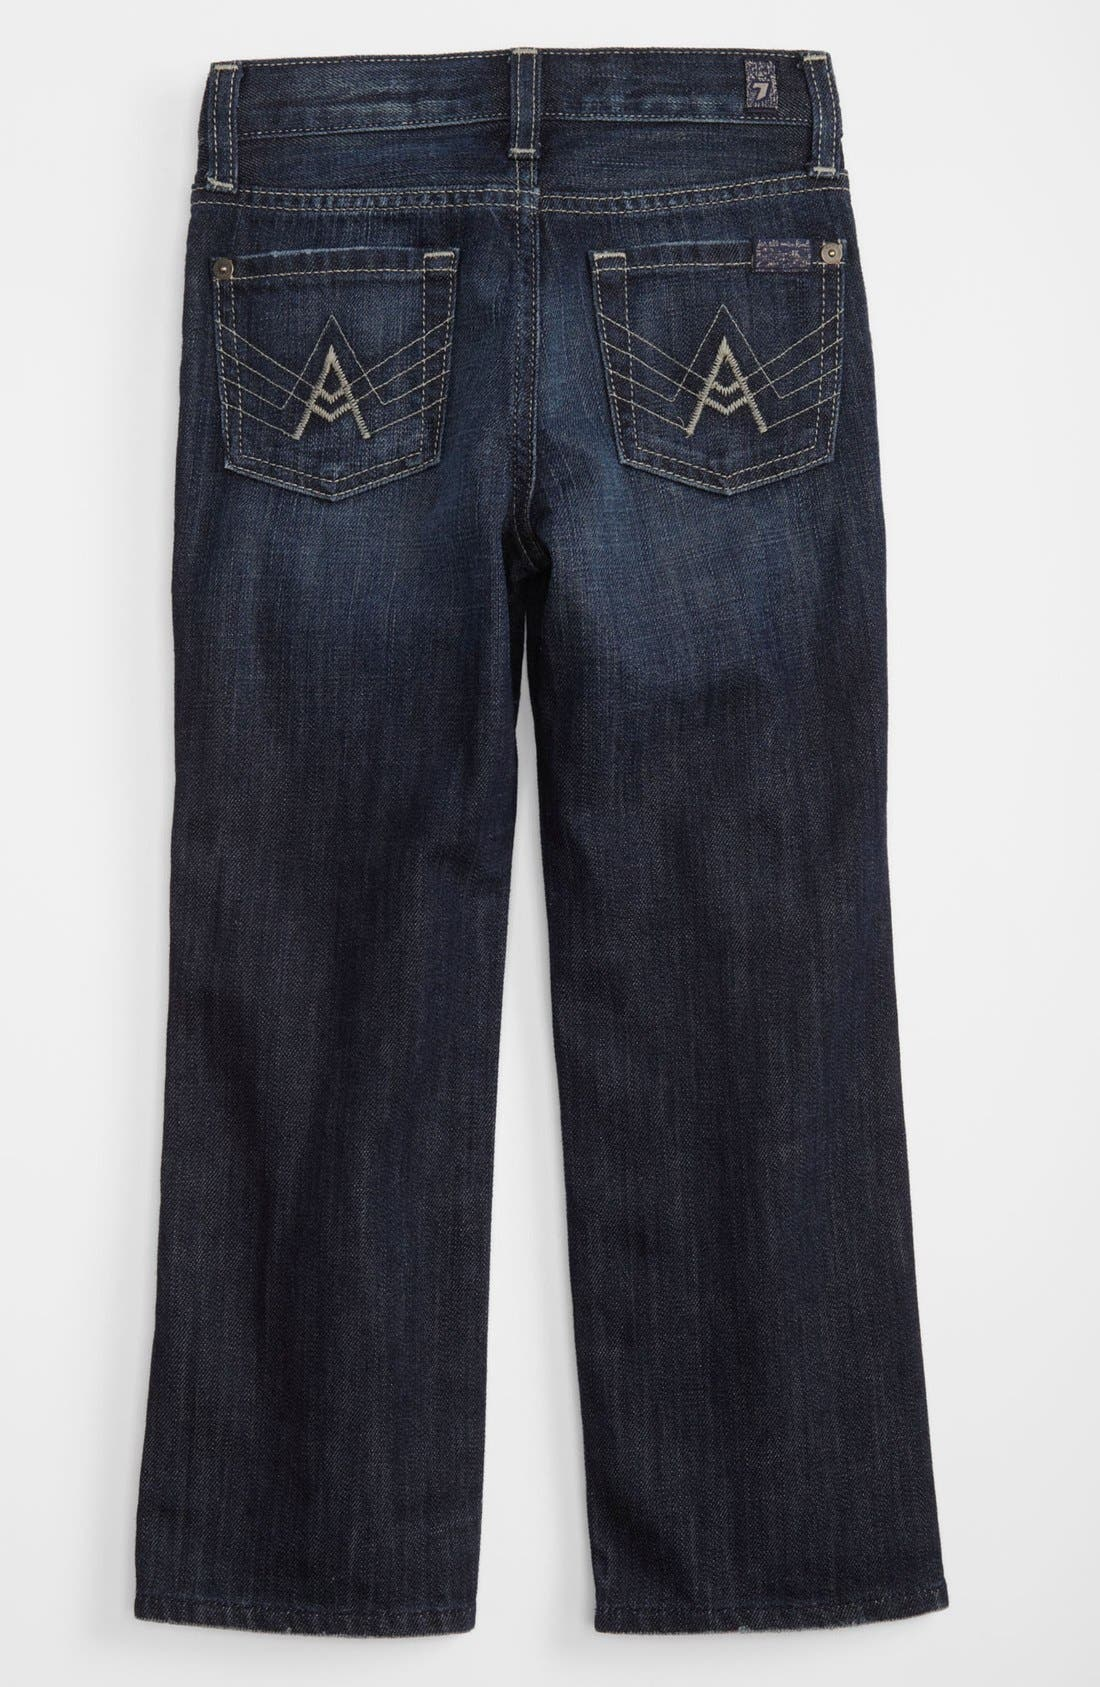 Alternate Image 1 Selected - 7 For All Mankind® 'Standard' Straight Leg Jeans (Little Boys & Big Boys) (Online Only)